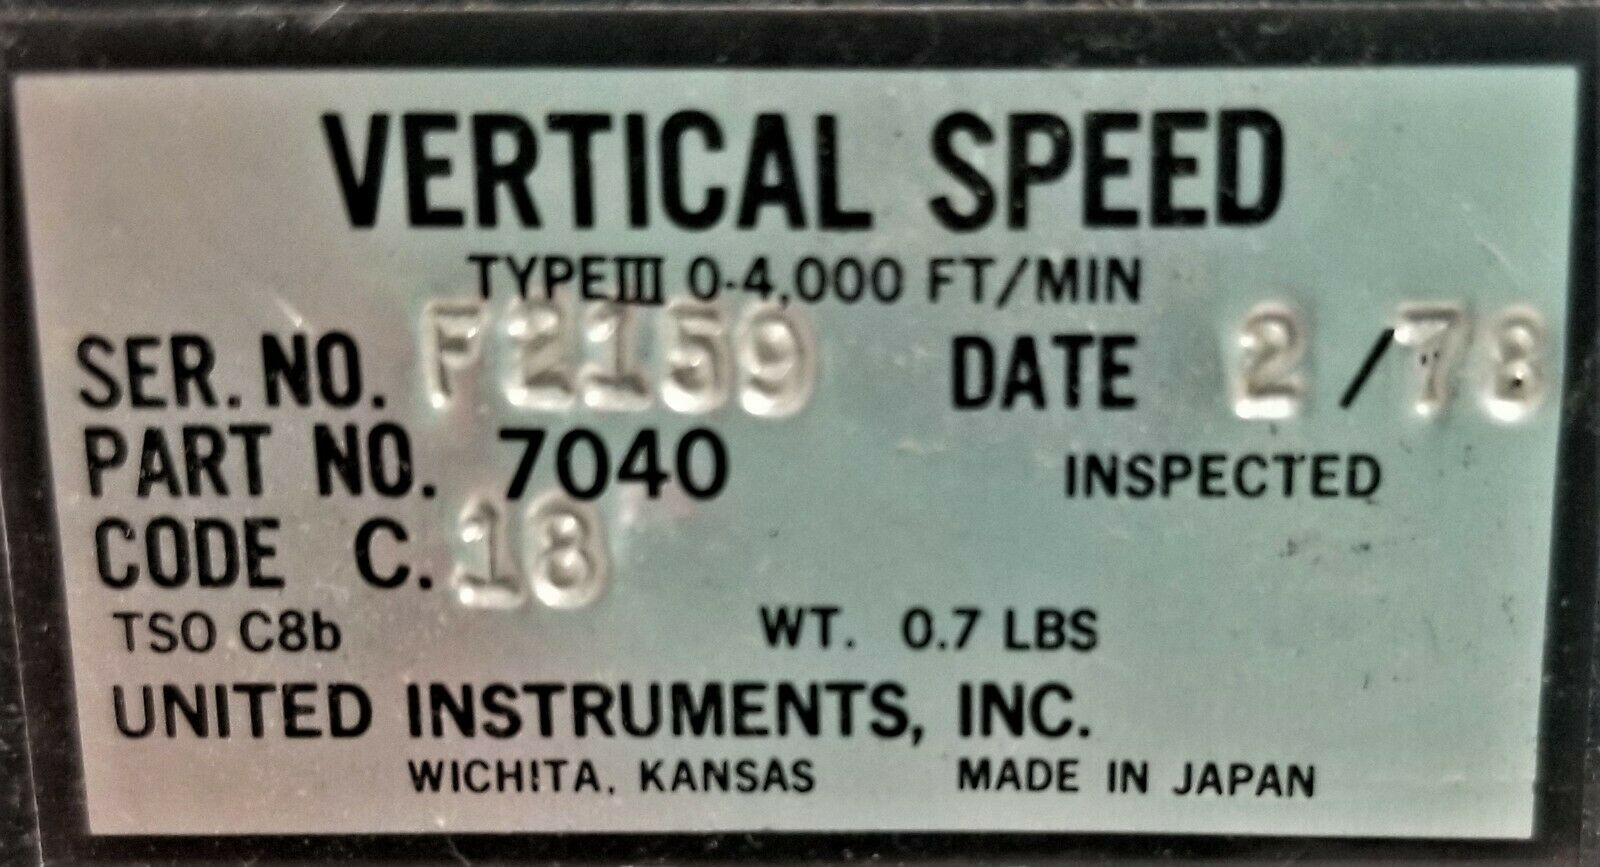 7040 VERTICAL SPEED INDICATOR